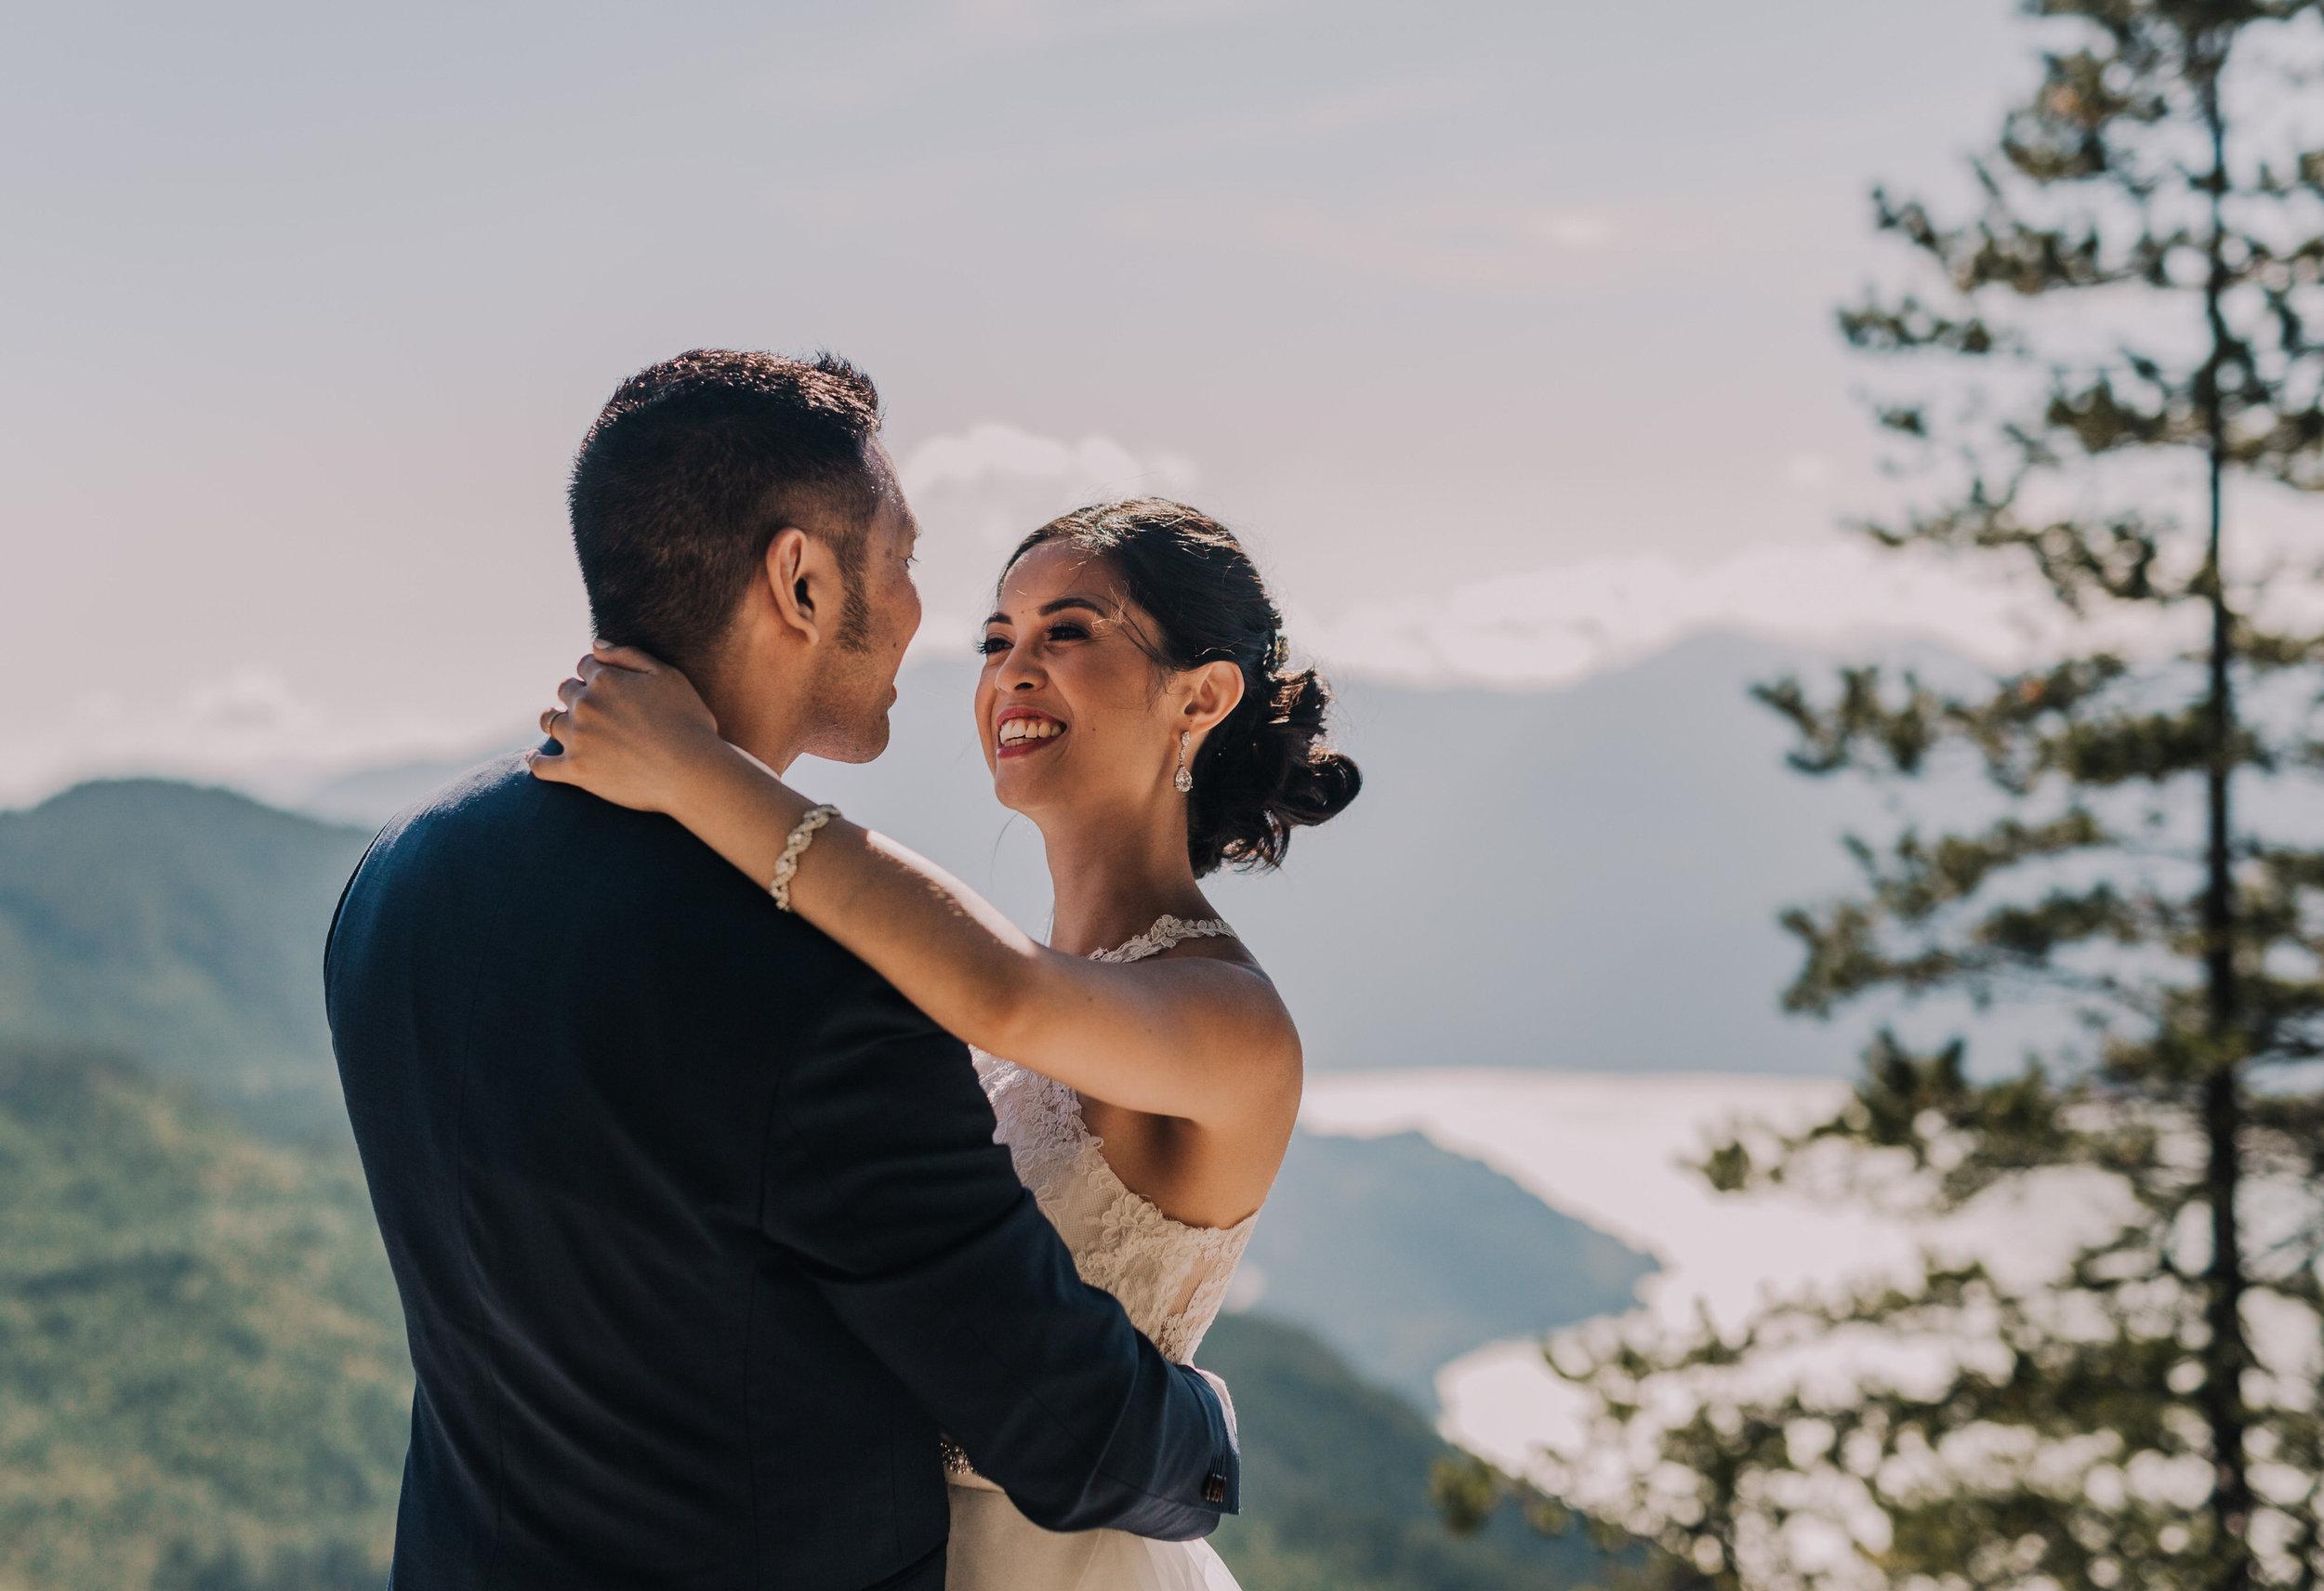 Squamish Wedding Photographer - Sea to Sky Gondola Wedding Photos -  Vancouver Wedding Photographer & Videographer - Sunshine Coast Wedding Photos - Sunshine Coast Wedding Photographer - Jennifer Picard Photography - IMG_3447.jpg